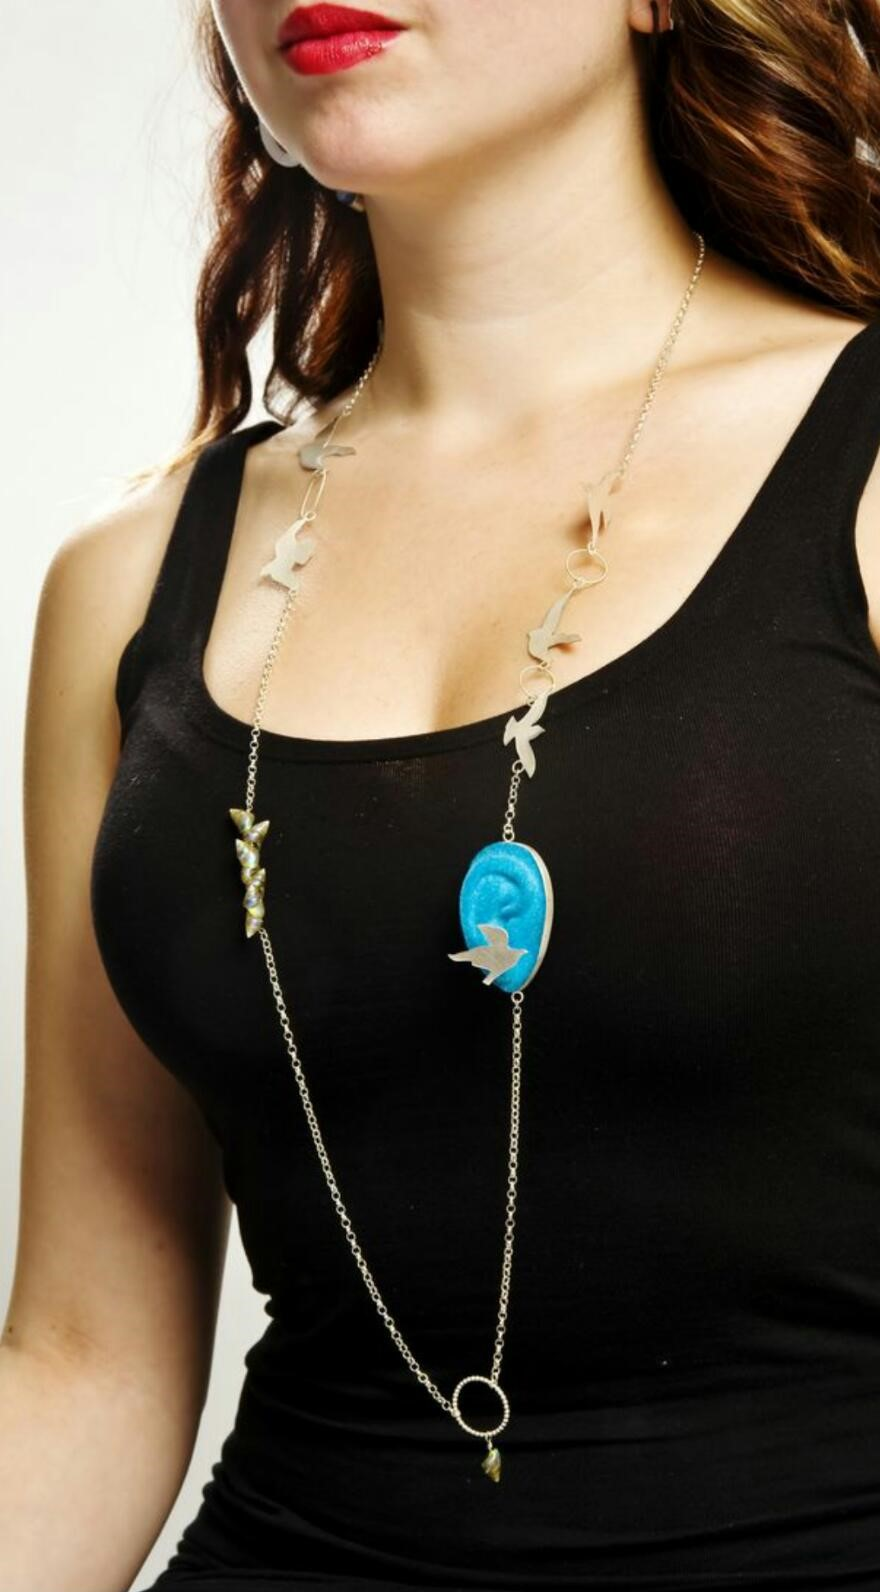 london-jewellery-school-blog-offline-promotion-jewellery-business